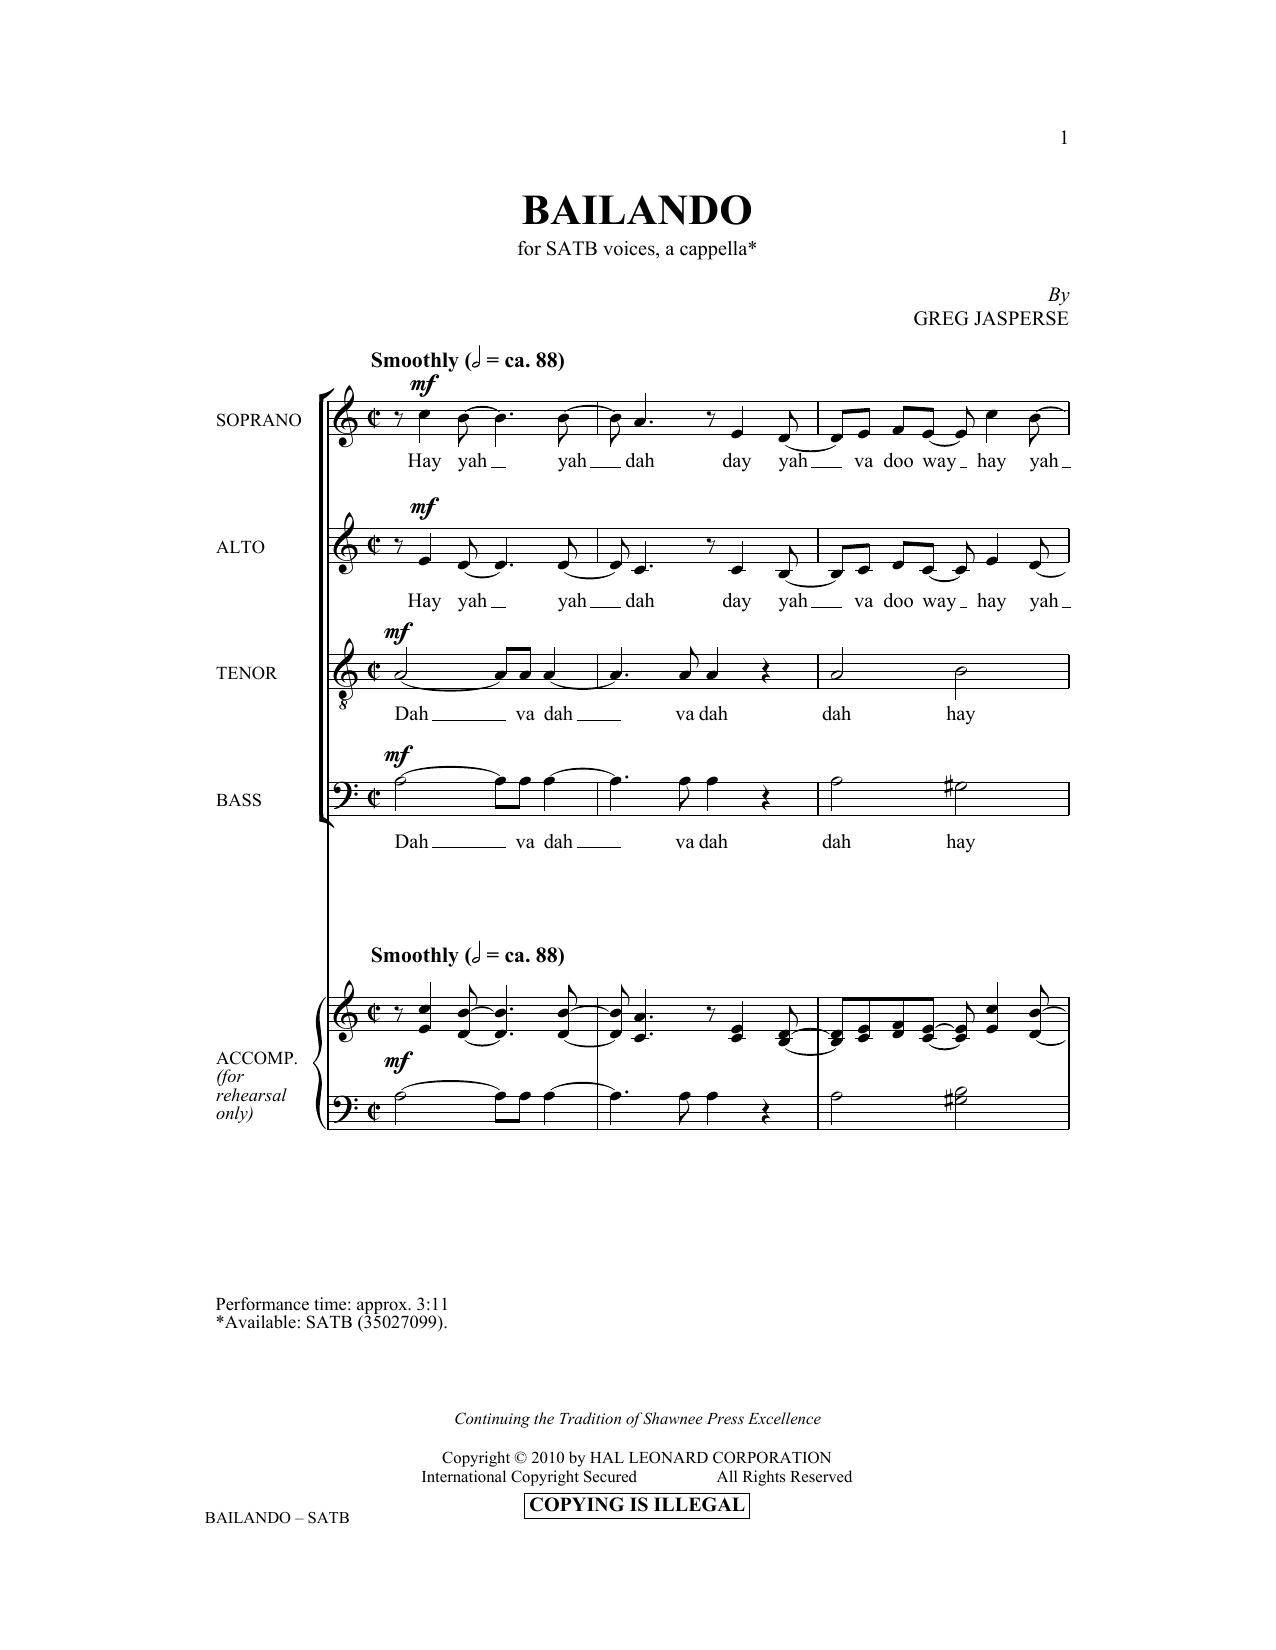 Greg Jasperse Bailando sheet music notes and chords. Download Printable PDF.